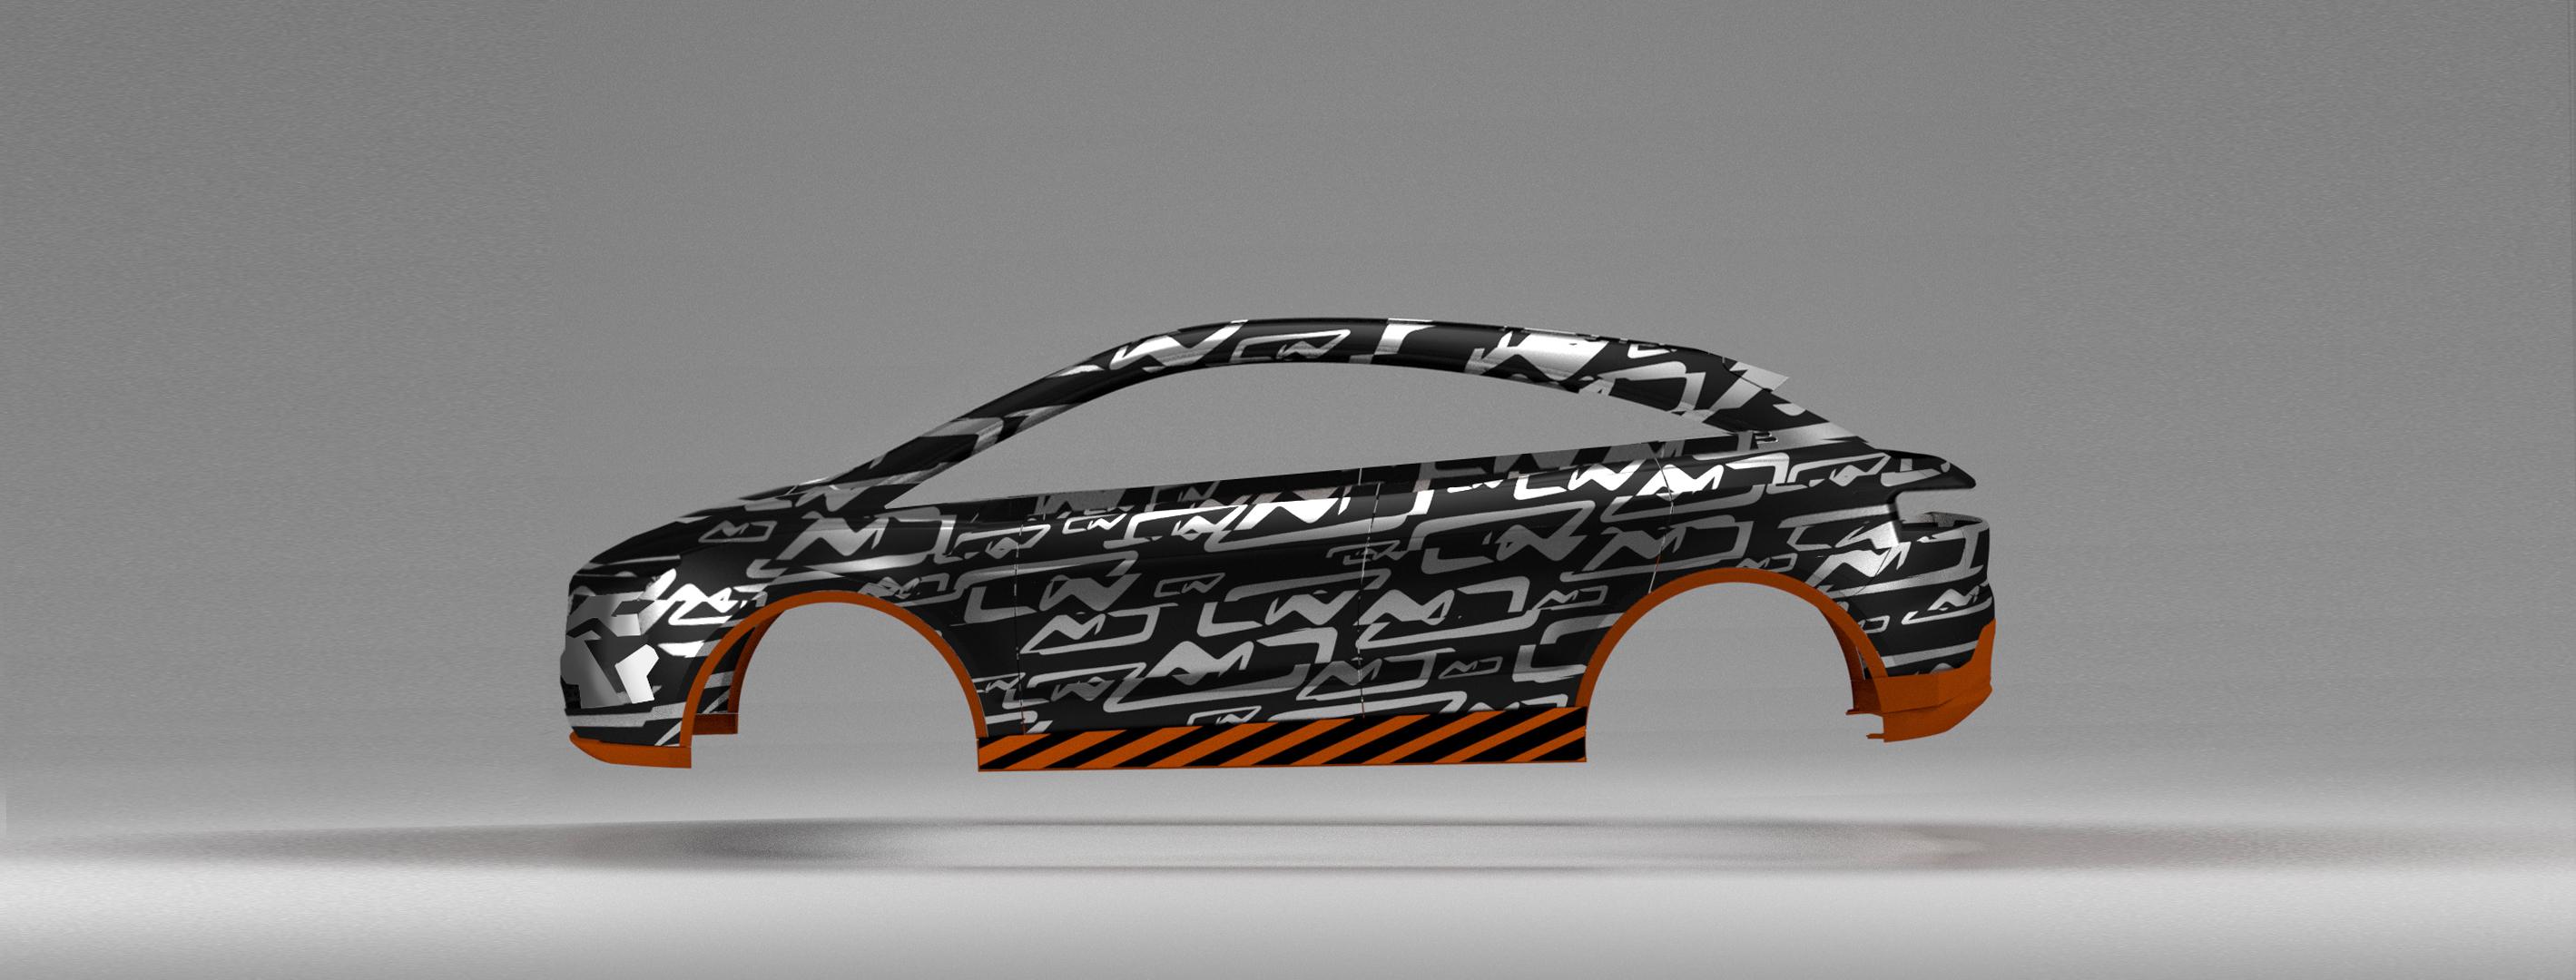 Prototype construction car Creative Wave